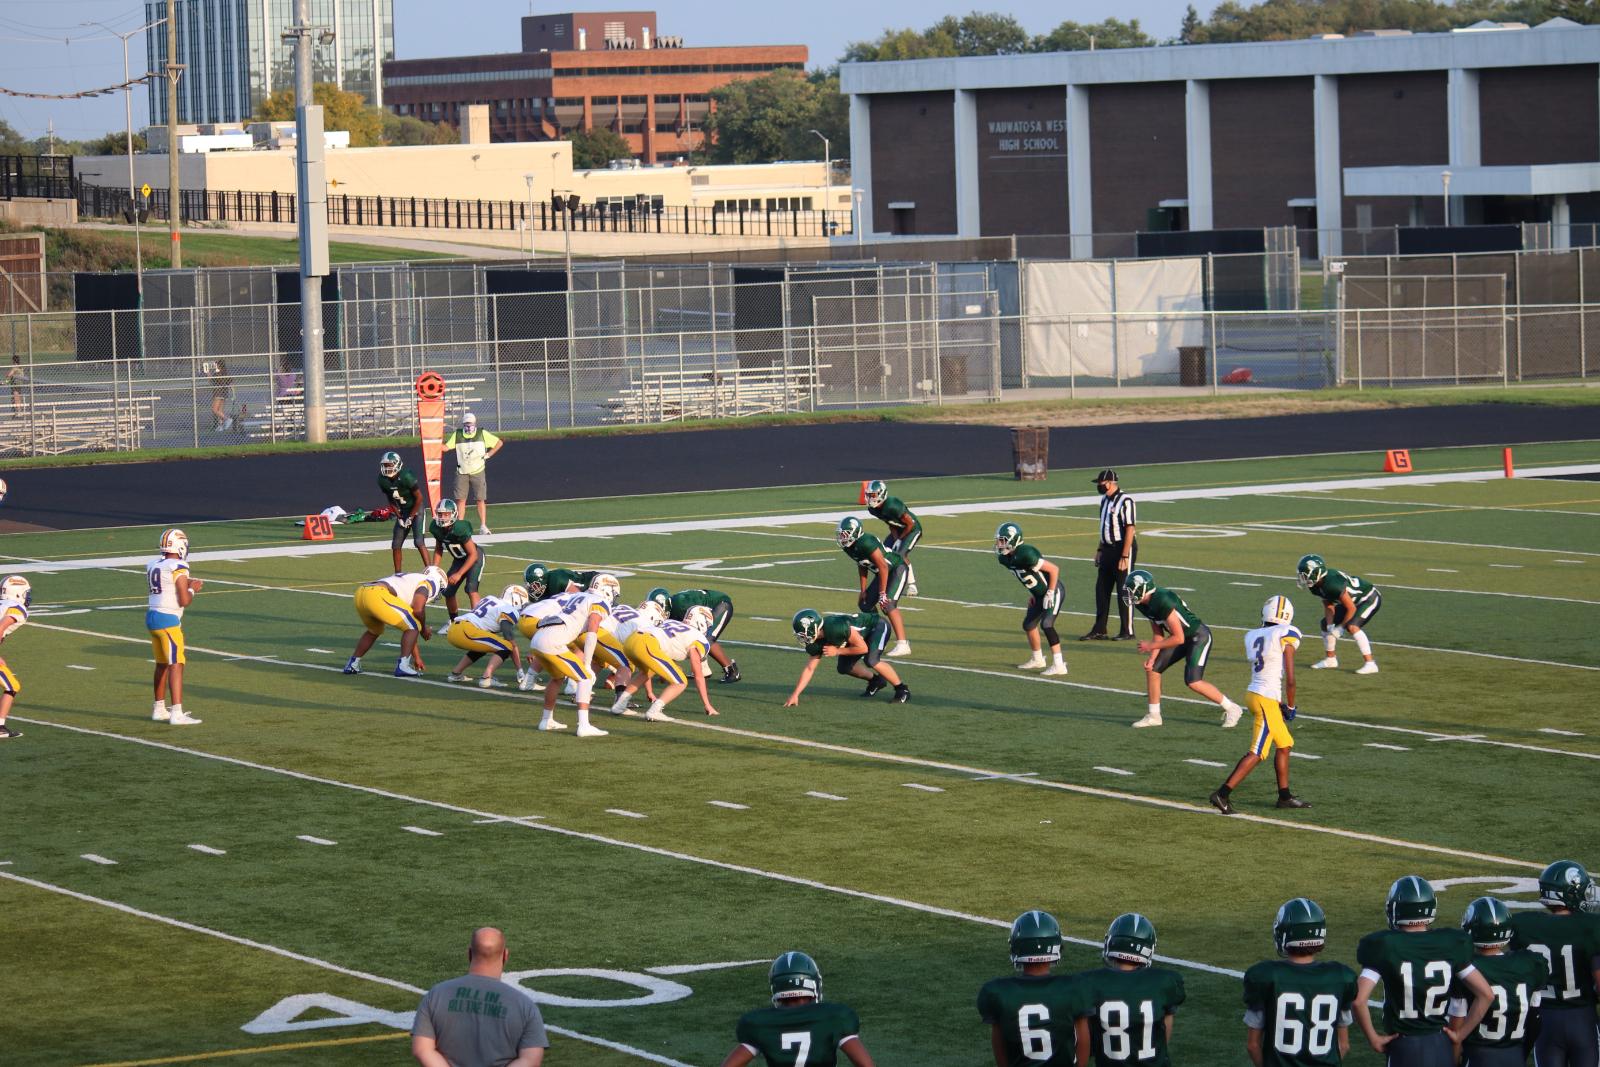 JV Football vs Catholic Memorial – 9/24/20 – Photos courtesy of Cindy Lakatos